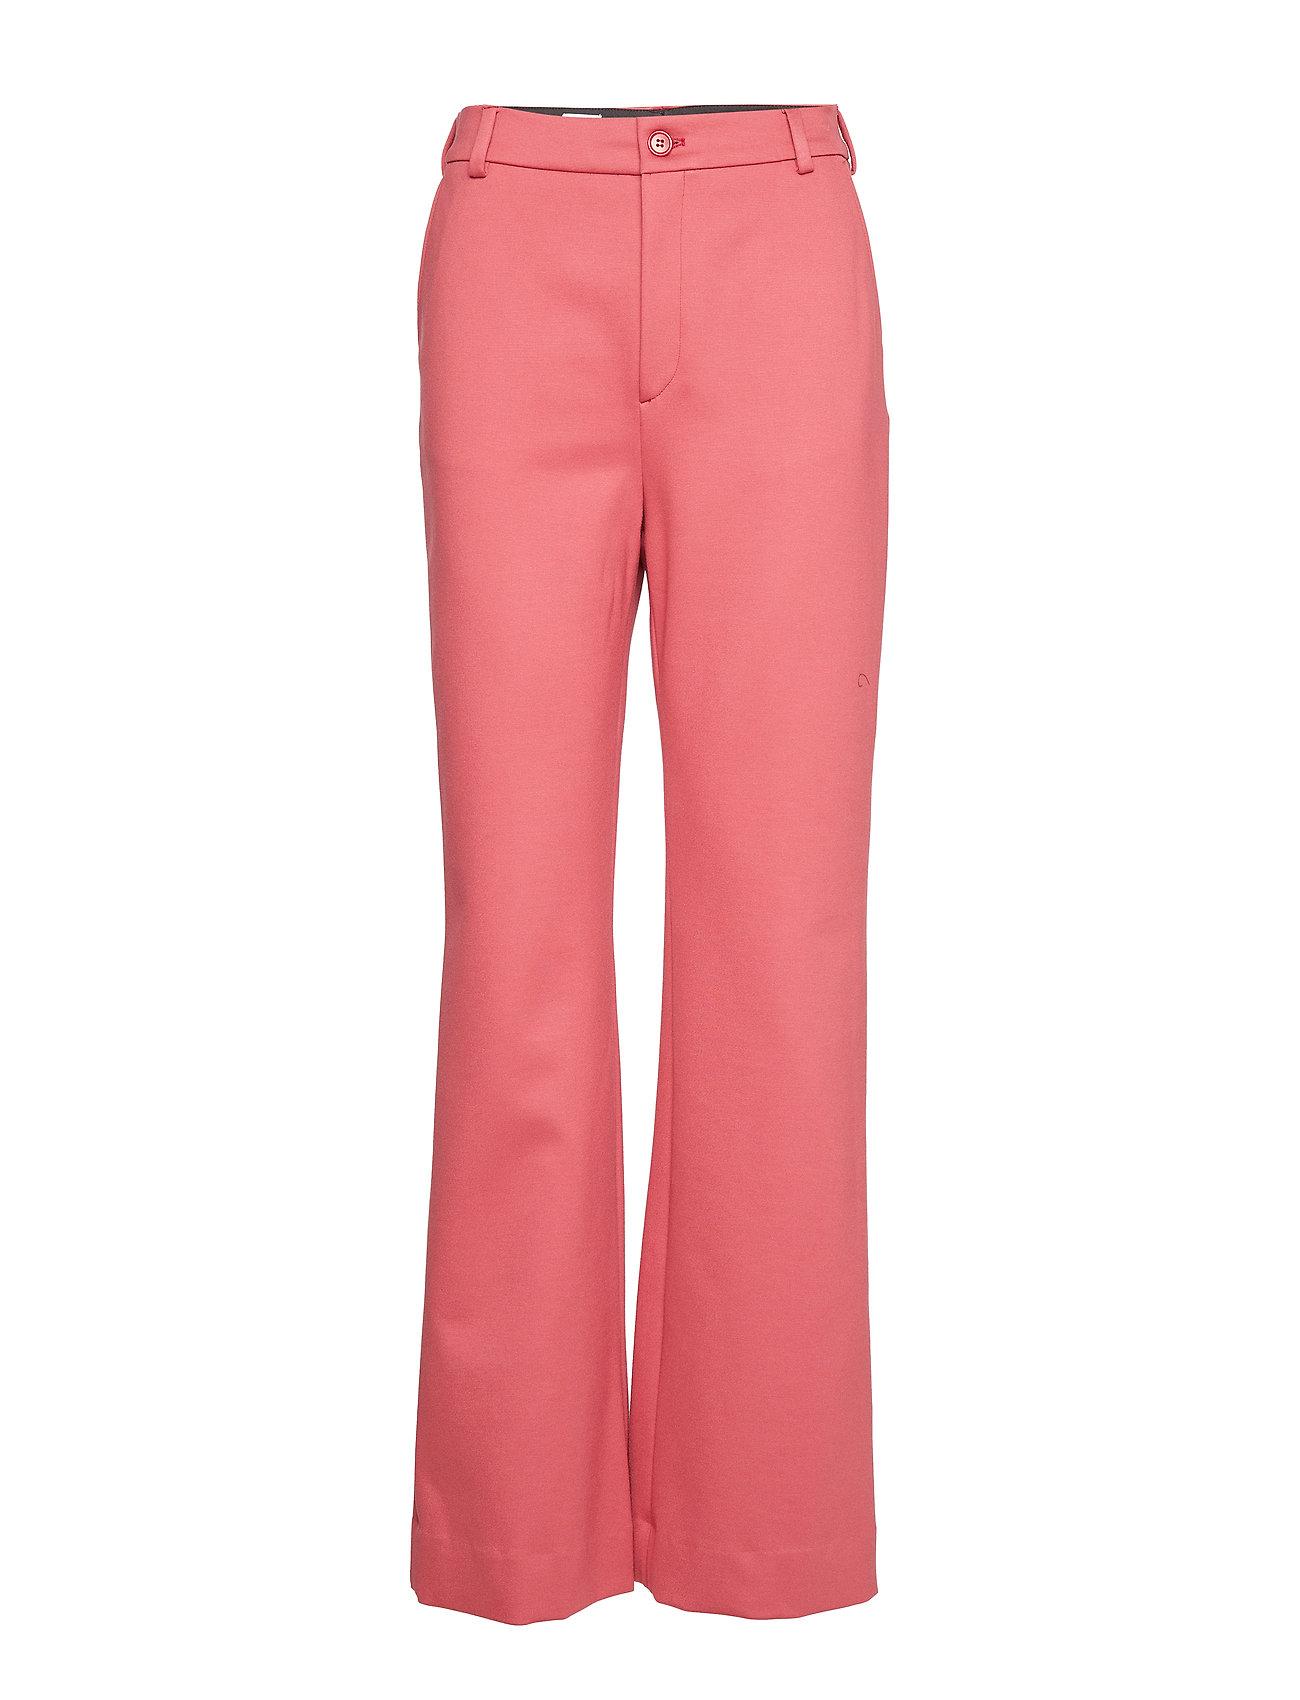 Filippa K Ivy Jersey Trouser - RASPBERRY